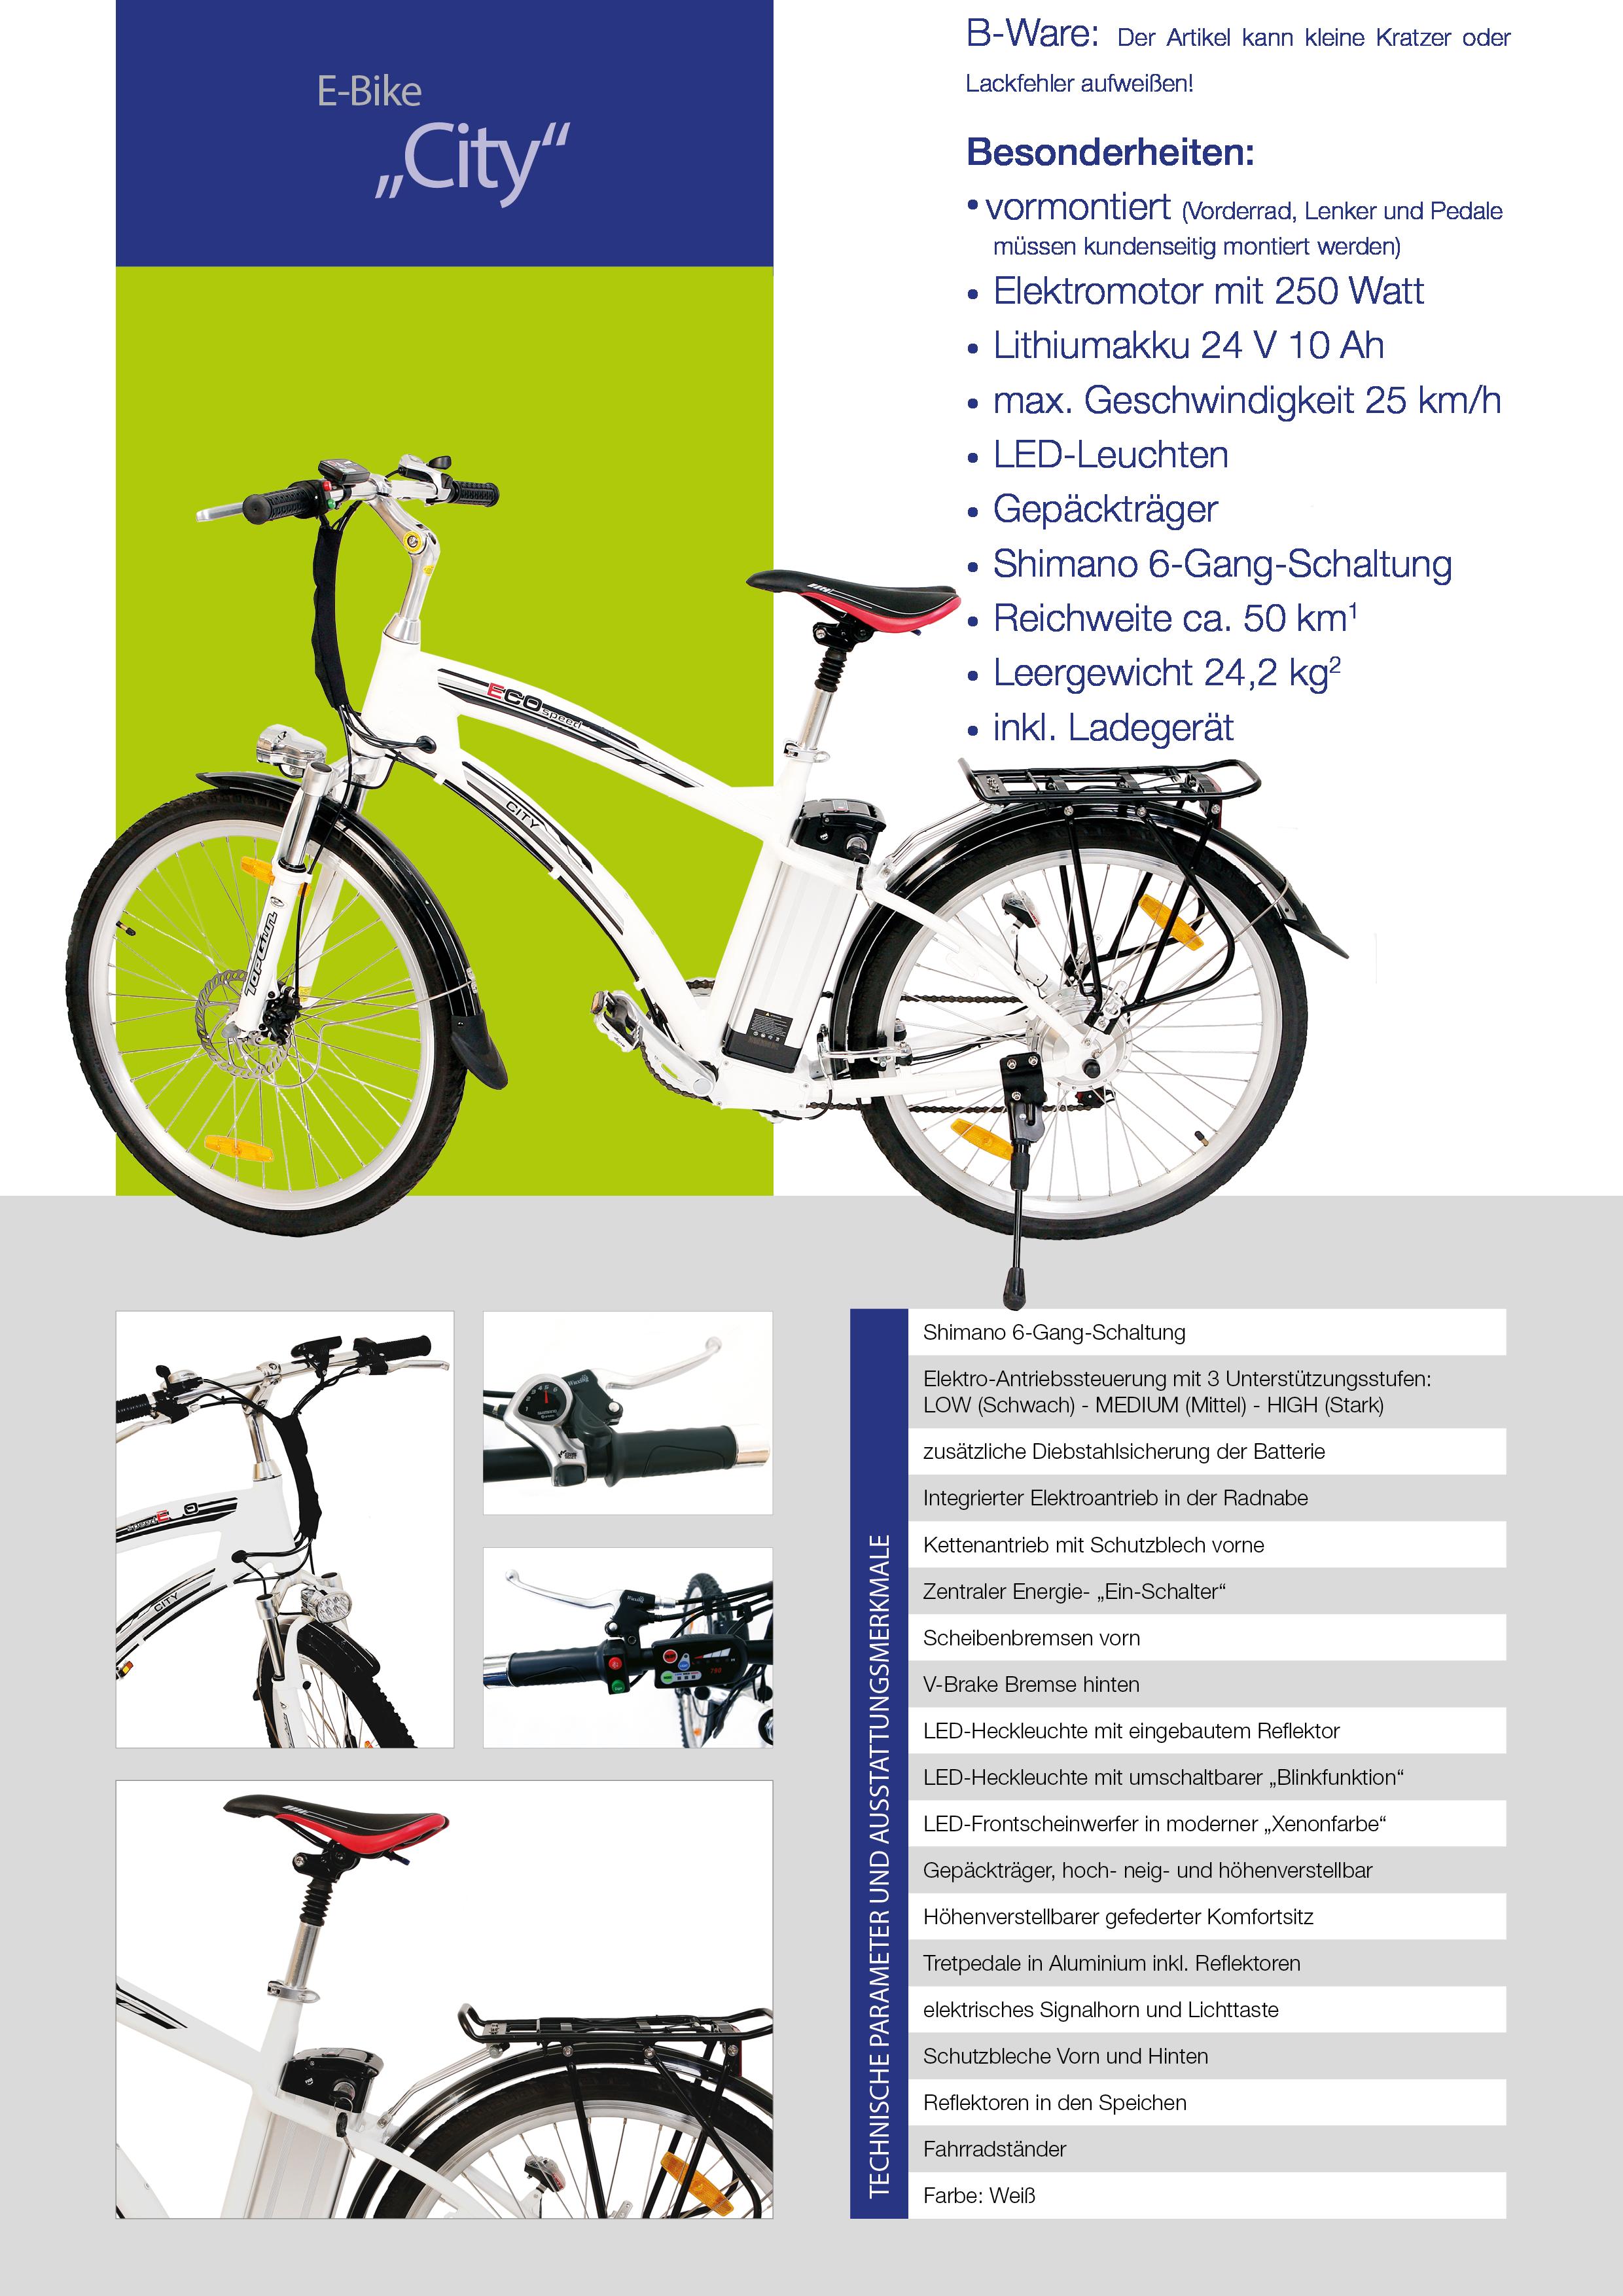 elektrofahrrad e bike pedelec city 250w 25km h 6 gang. Black Bedroom Furniture Sets. Home Design Ideas